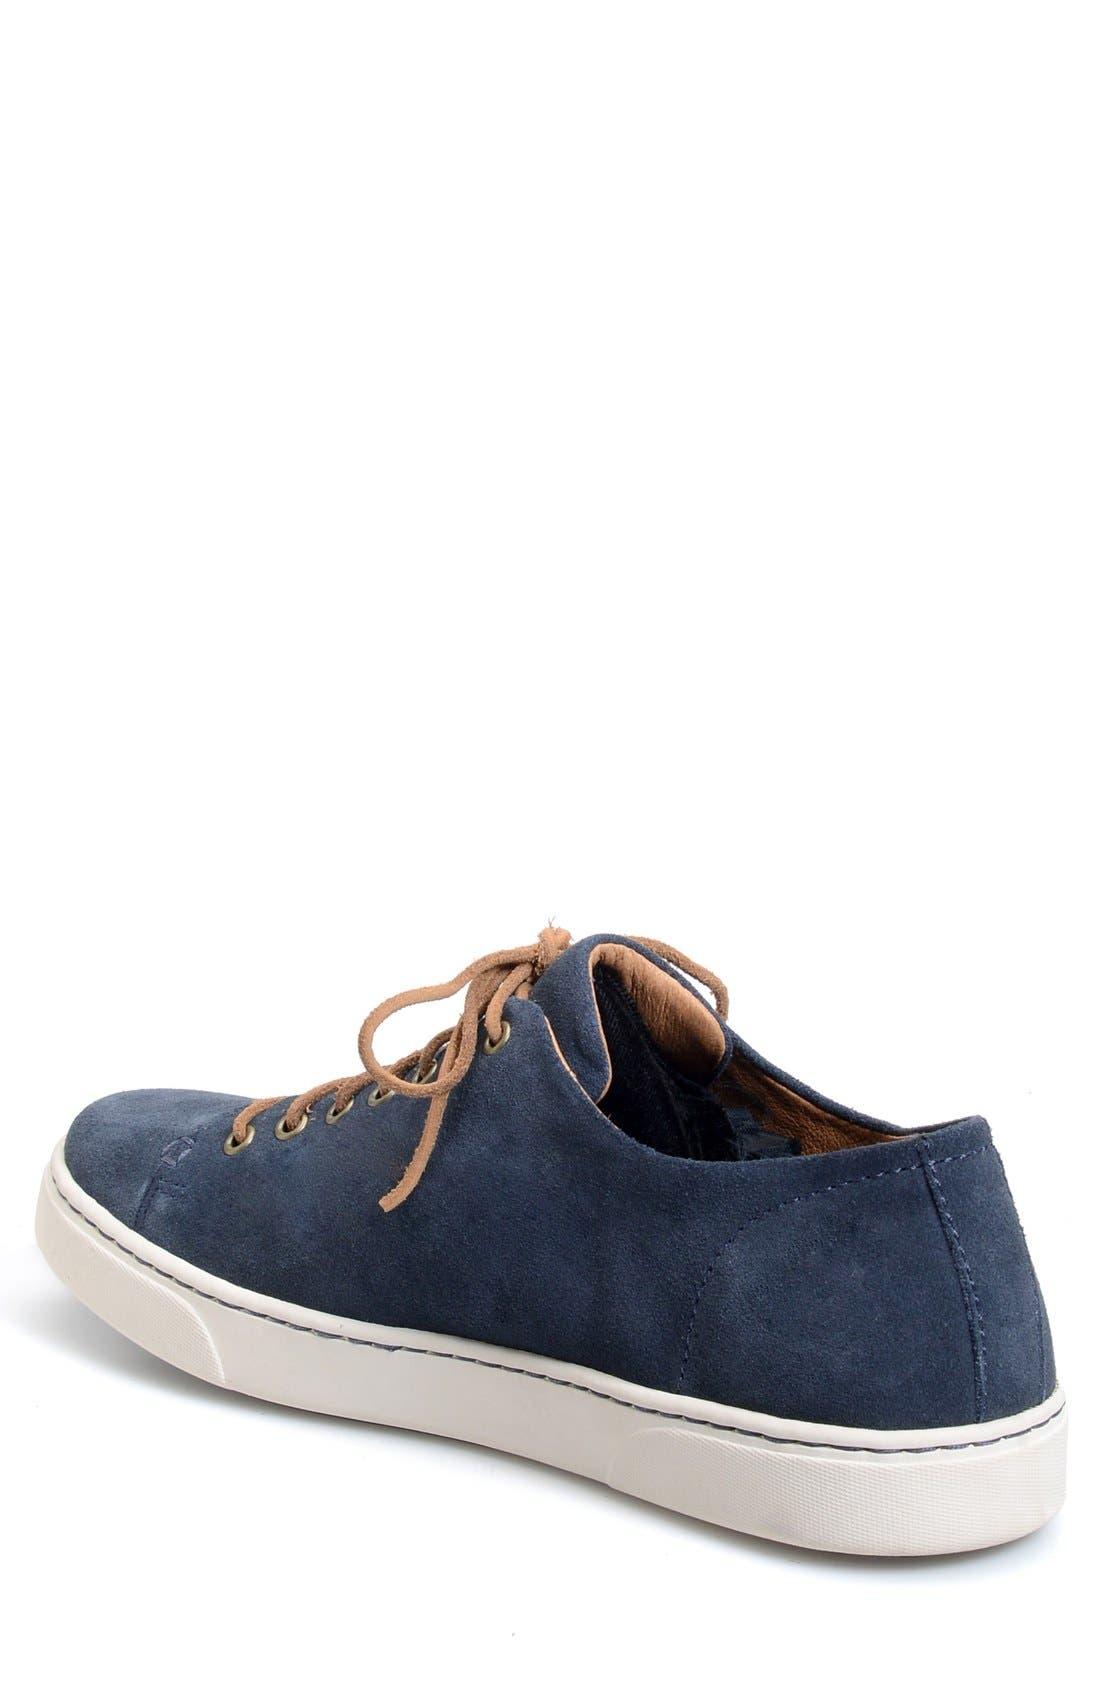 'Bayne' Cap Toe Sneaker,                             Alternate thumbnail 18, color,